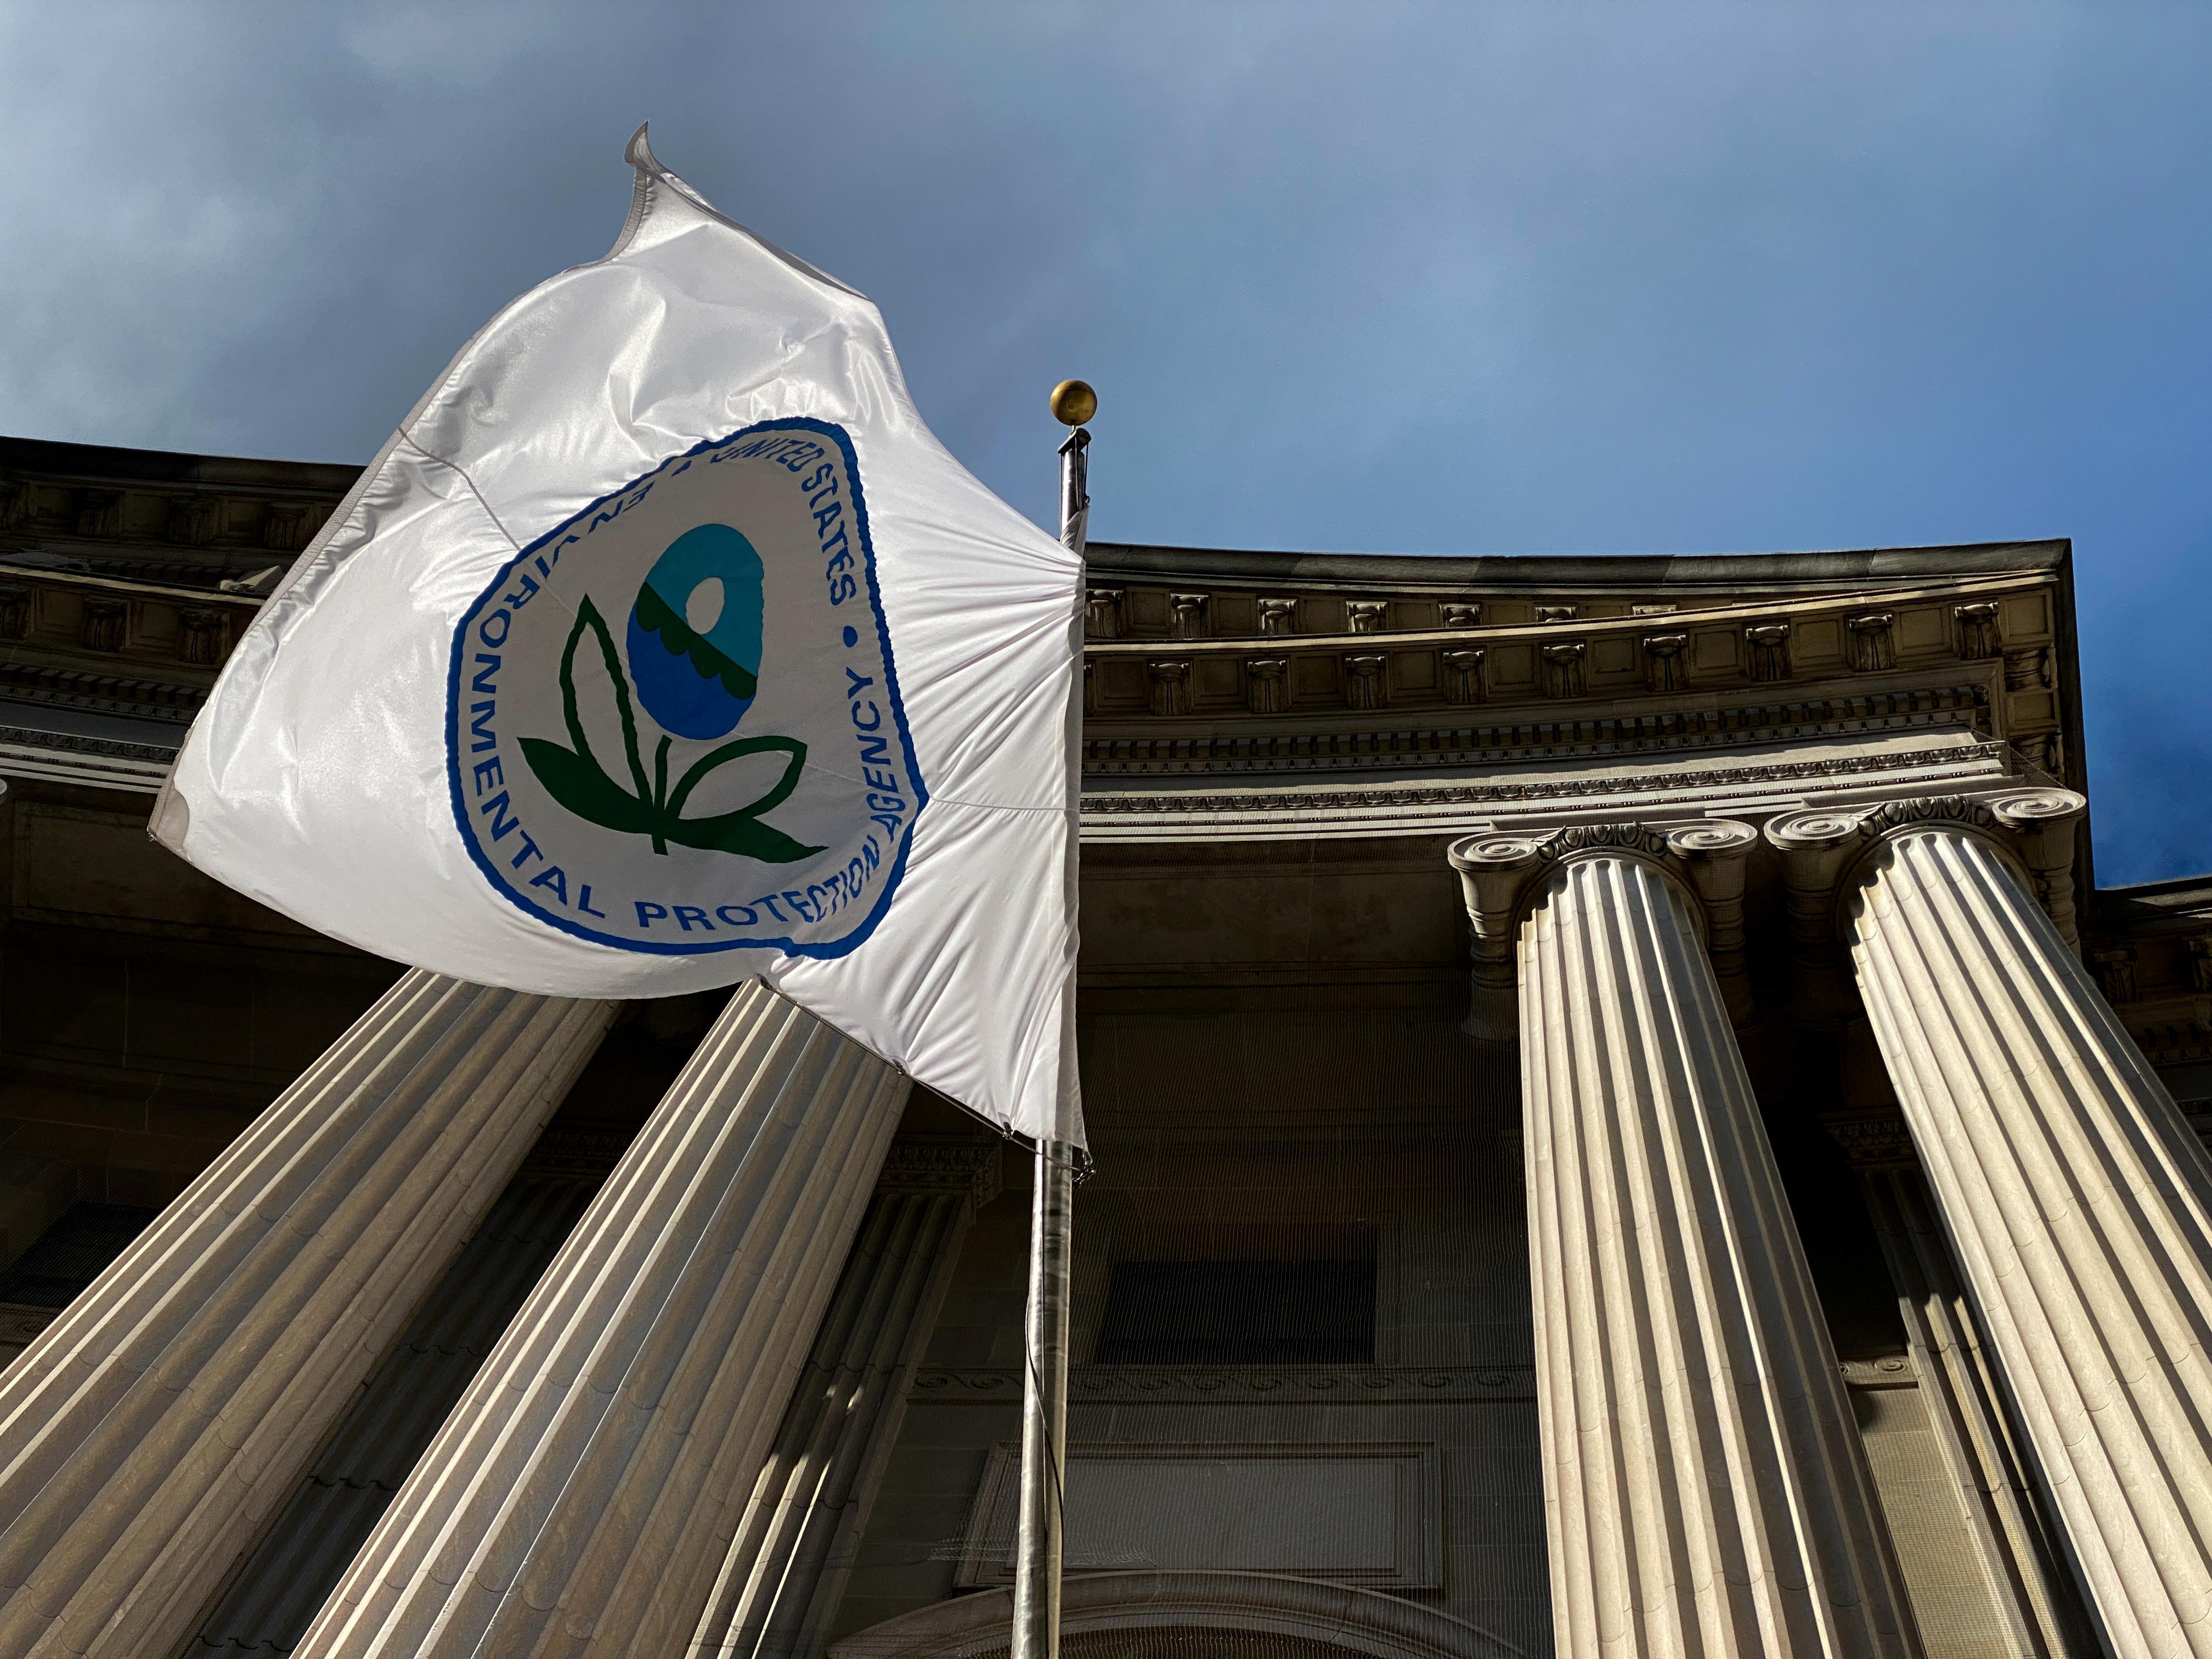 Court decision casts doubt on dozens of U.S. refinery biofuel waivers